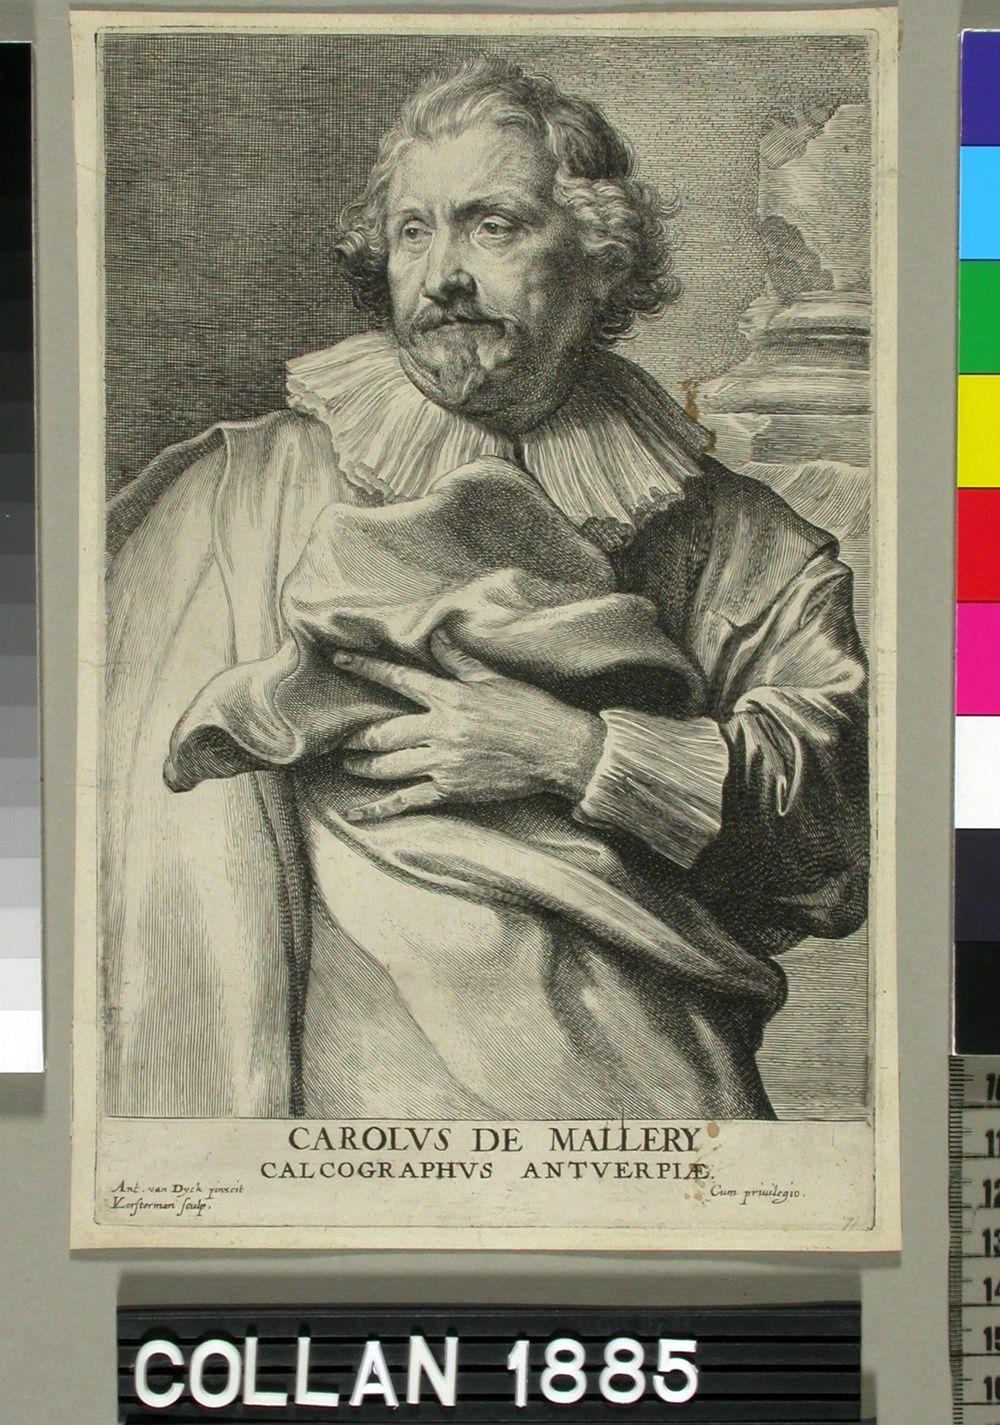 Carolus de Mallery